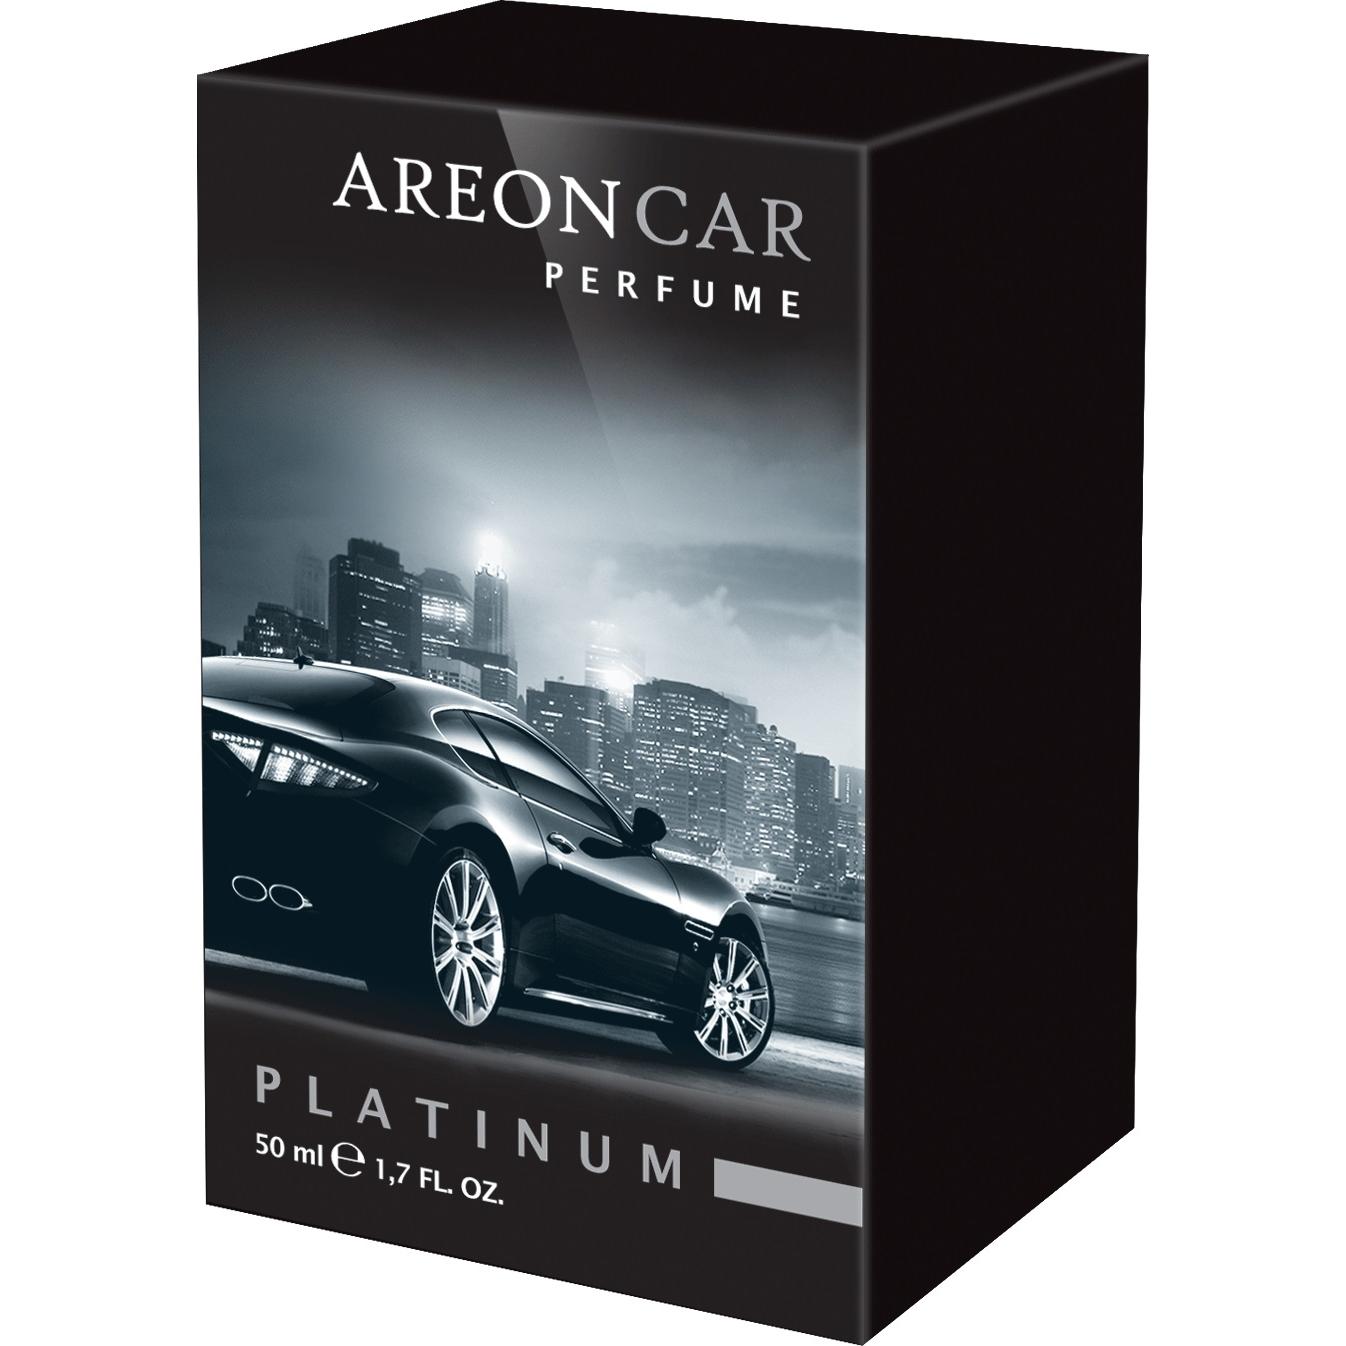 Odorizant auto, Areon Perfume new design, Platinum, 50 ml imagine MatHaus.ro